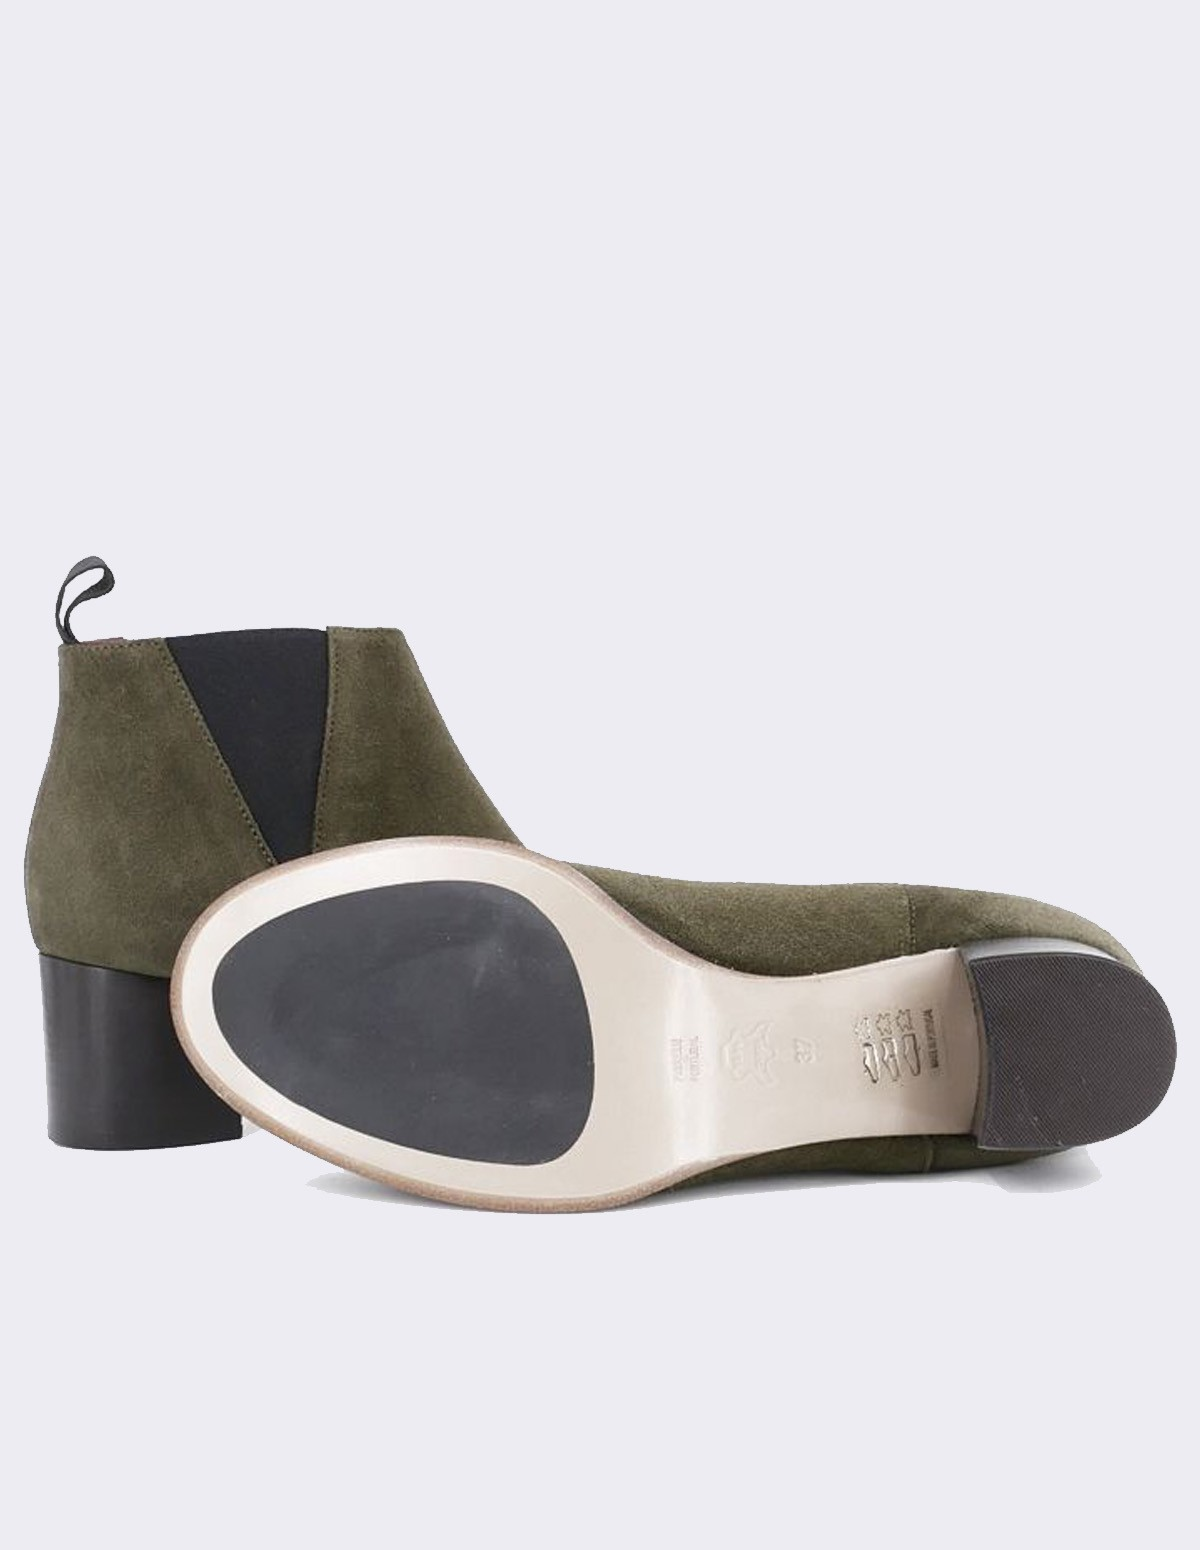 Ag Rove Boots